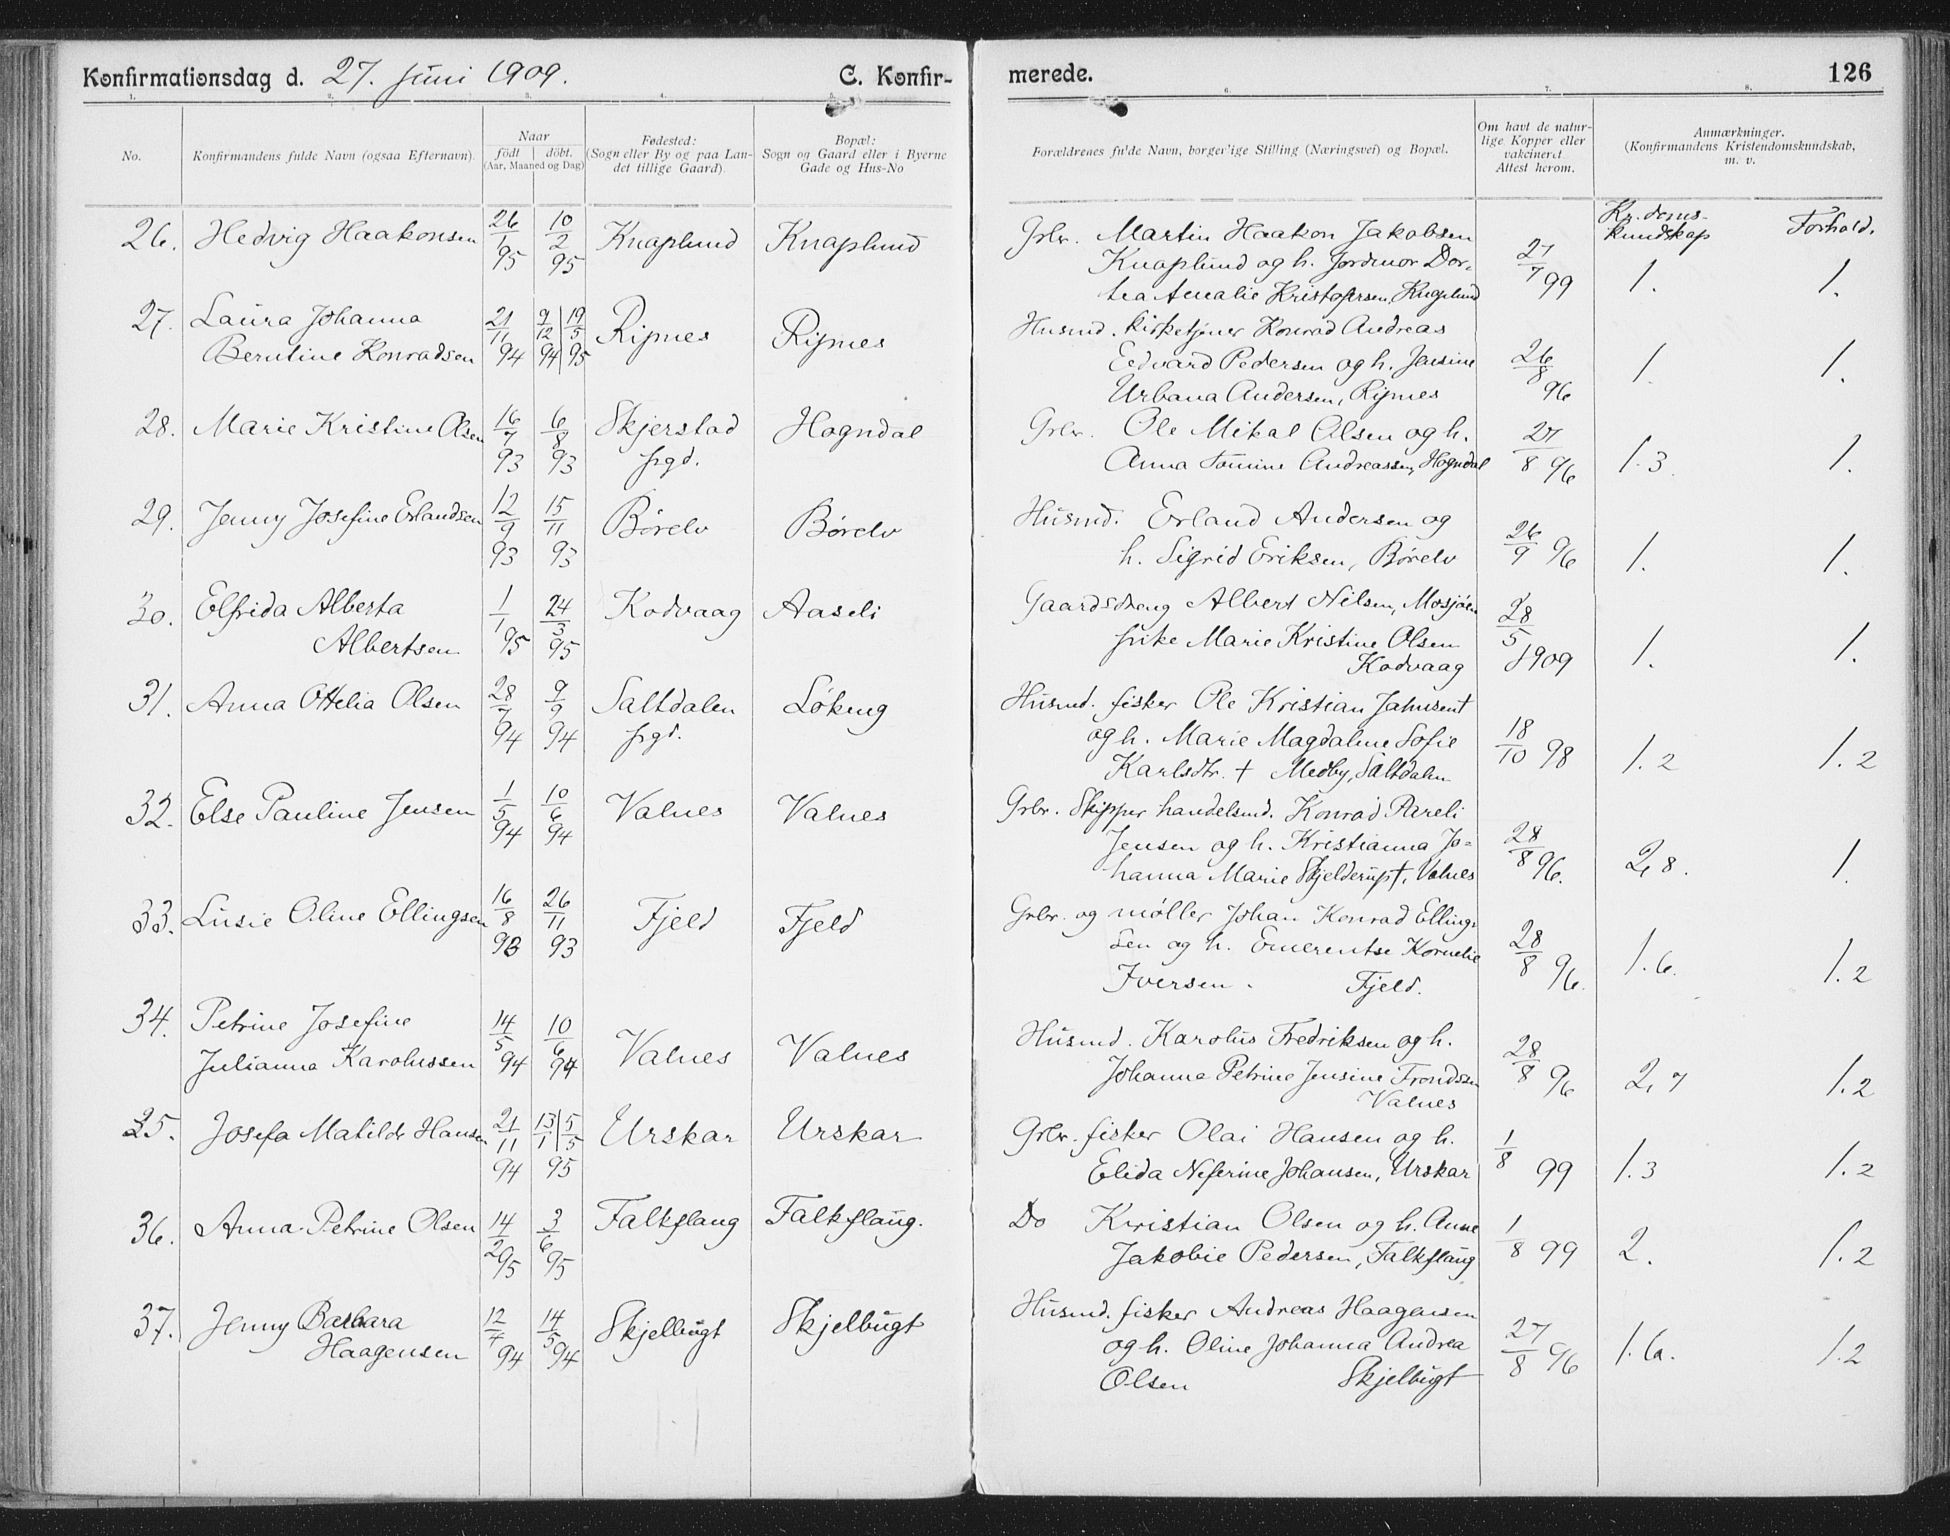 SAT, Ministerialprotokoller, klokkerbøker og fødselsregistre - Nordland, 804/L0081: Ministerialbok nr. 804A02, 1901-1915, s. 126